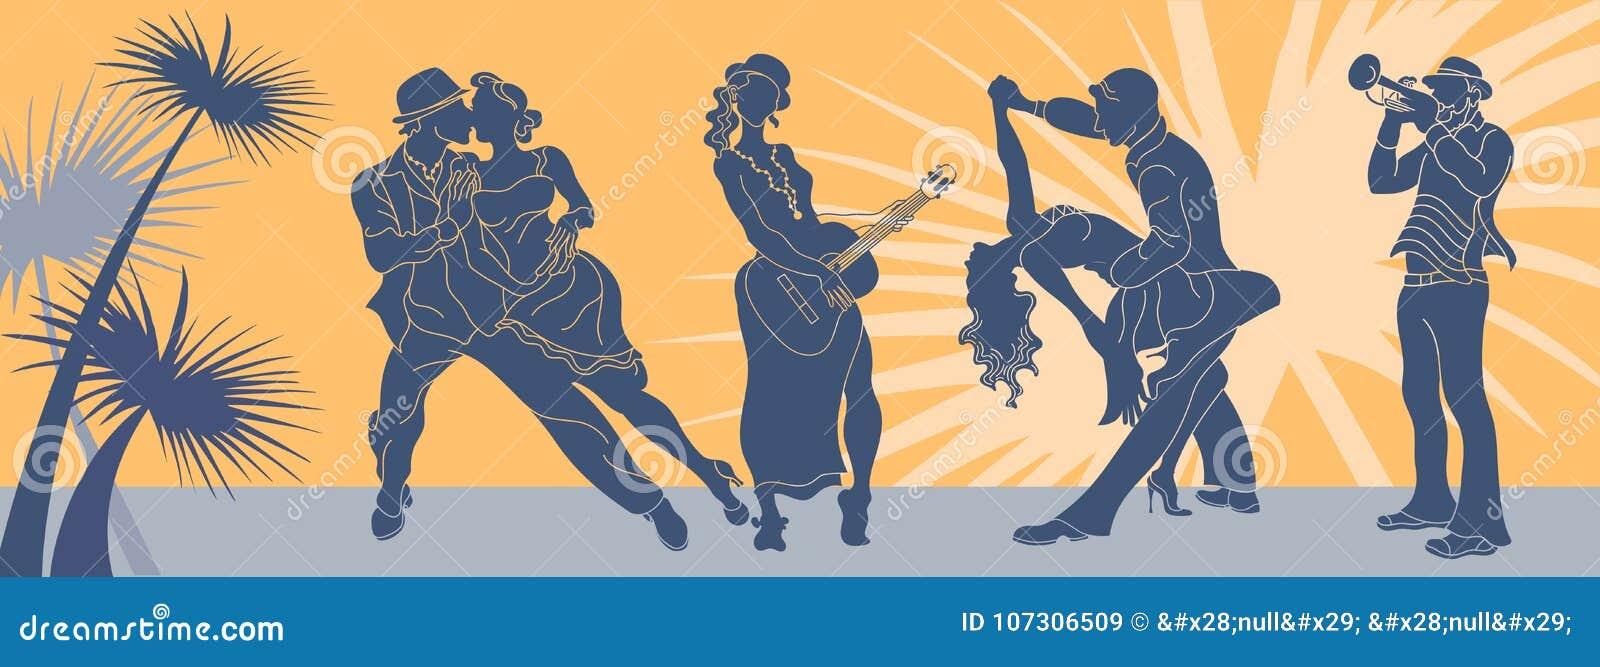 Salsa dance vector.Tango couple vector. Couple dancing salsa. Argentine tango.Web background salsa latino.Salsa music party banner